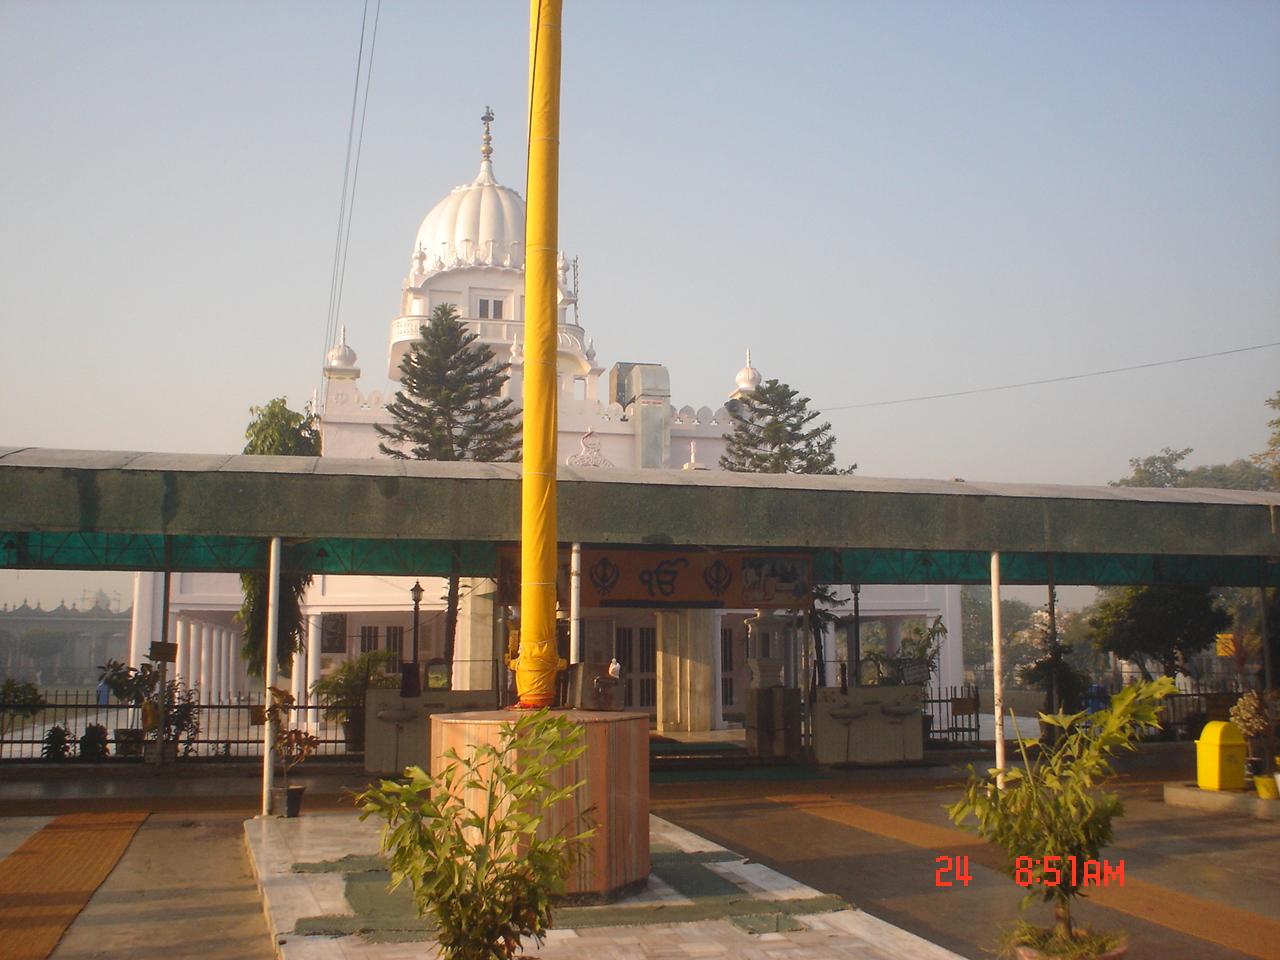 Manjhi Sahib - Must-Visit Sightseeing Destination in Ludhiana